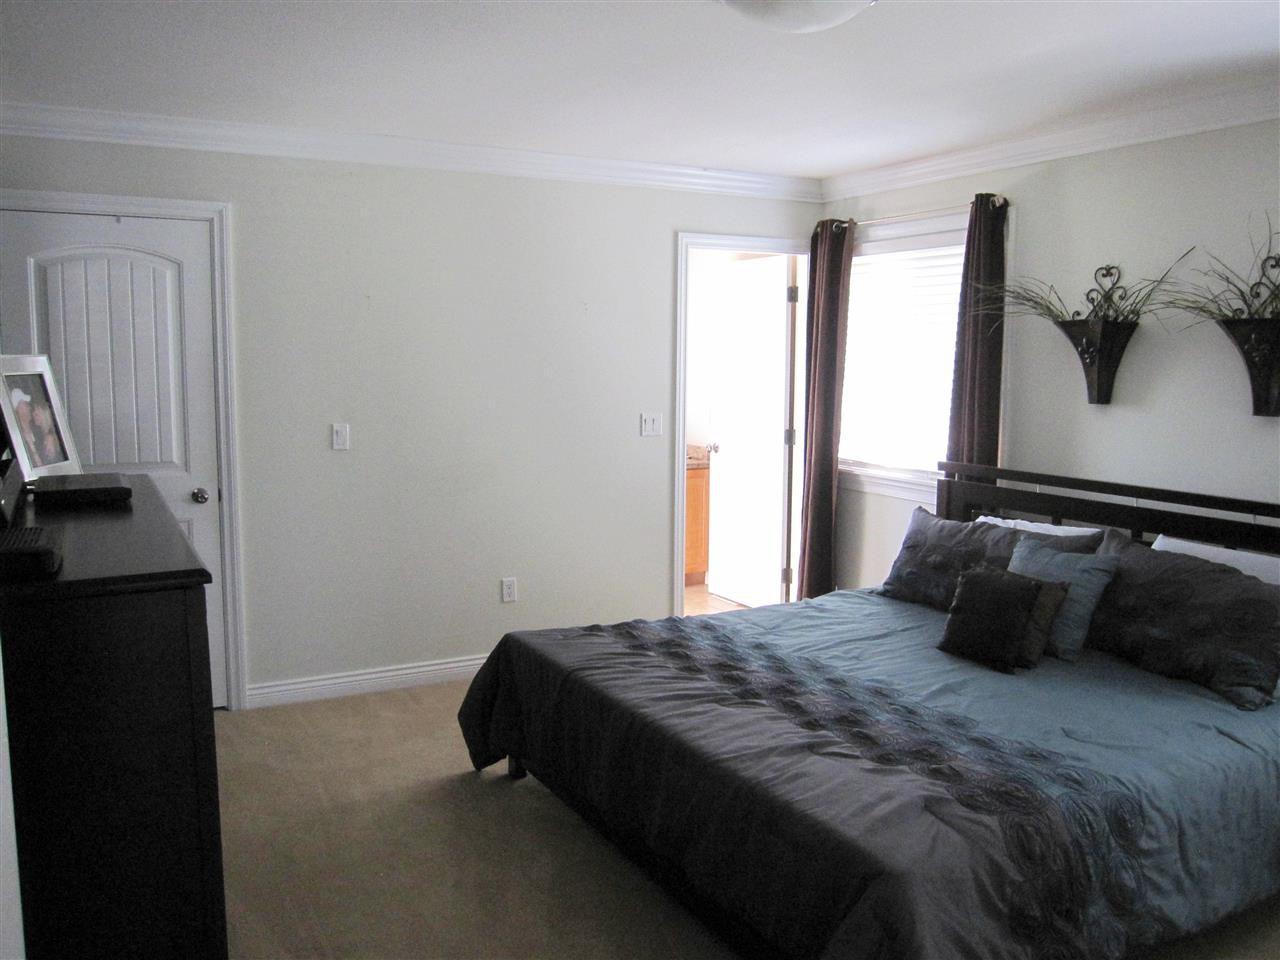 Photo 8: Photos: 11316 236 Street in Maple Ridge: Cottonwood MR House for sale : MLS®# R2062616